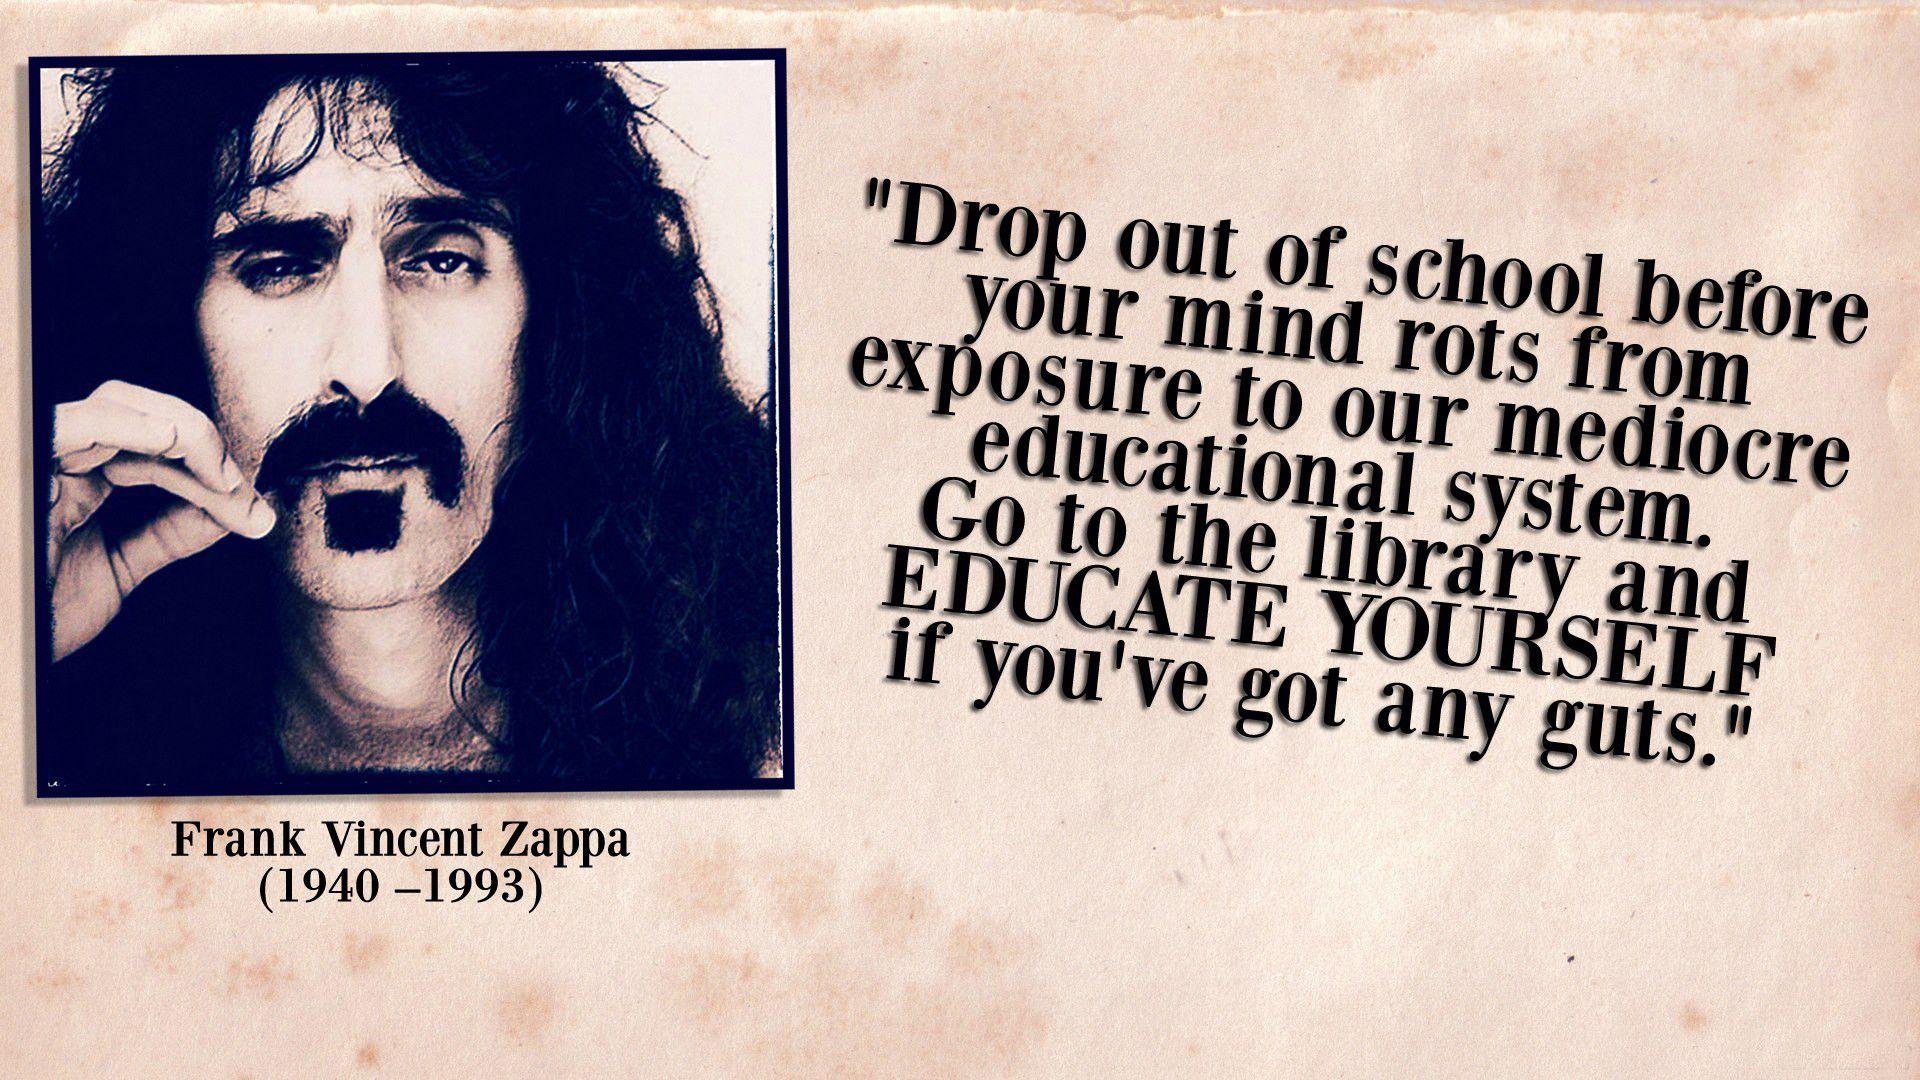 Frank Zappa - Drop out of school